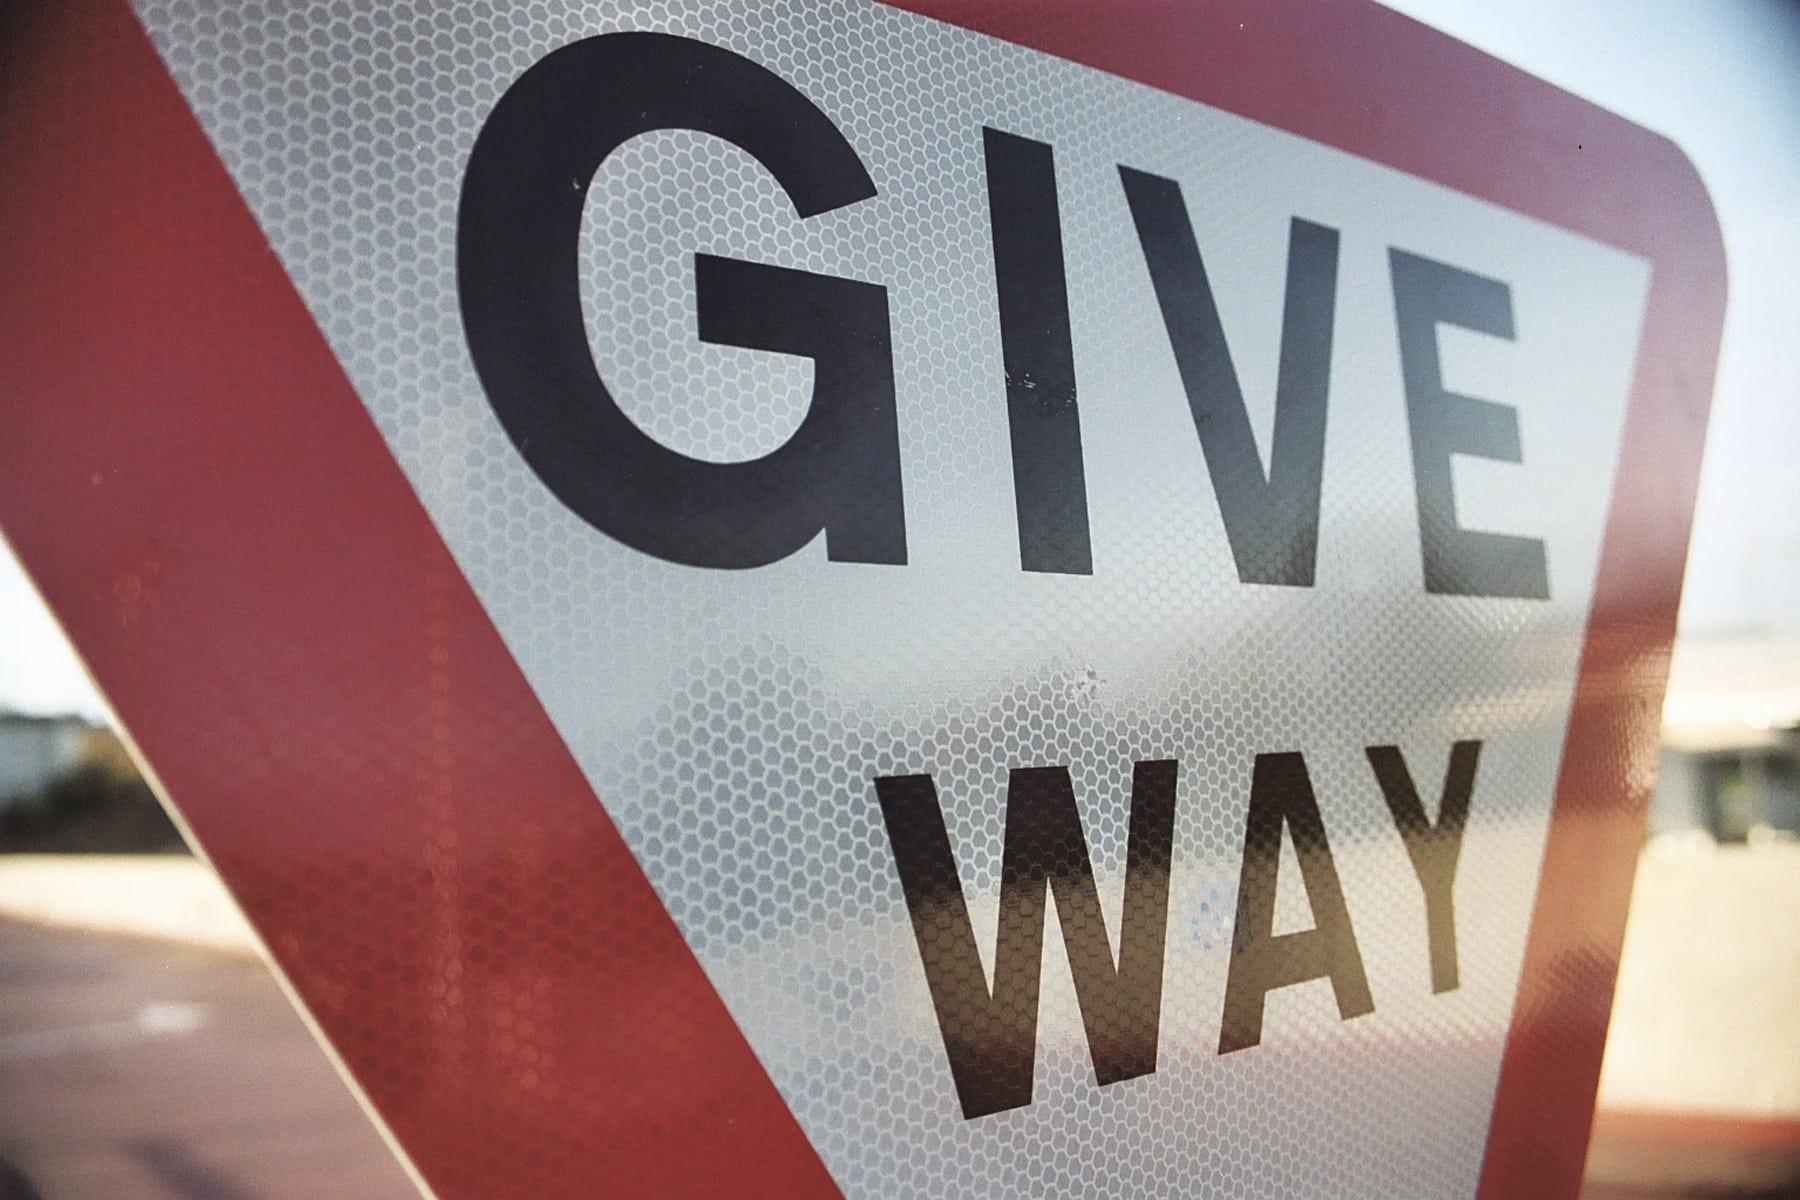 Give Way Road Sign Stock Photo